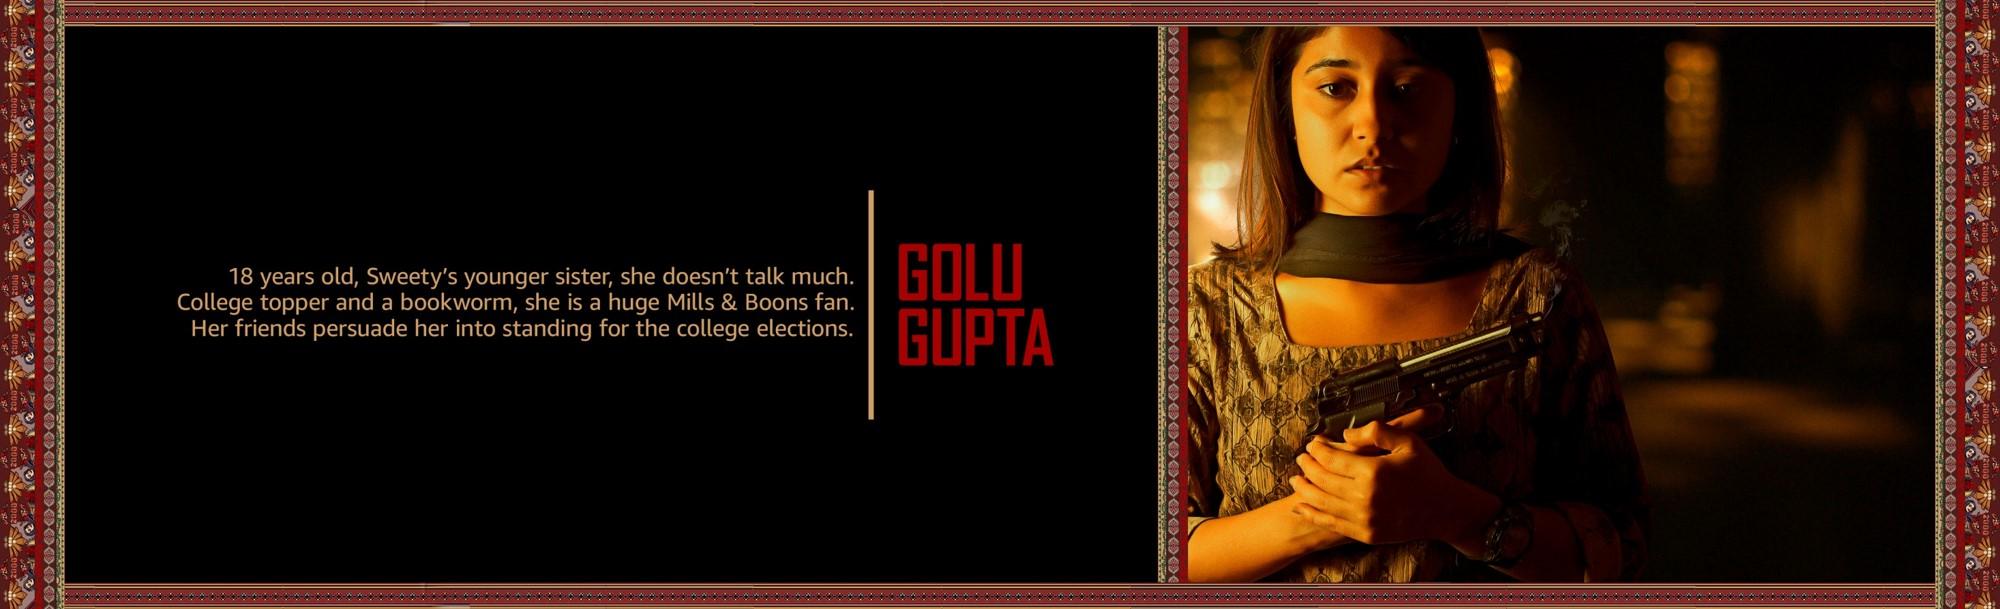 Golu Gupta